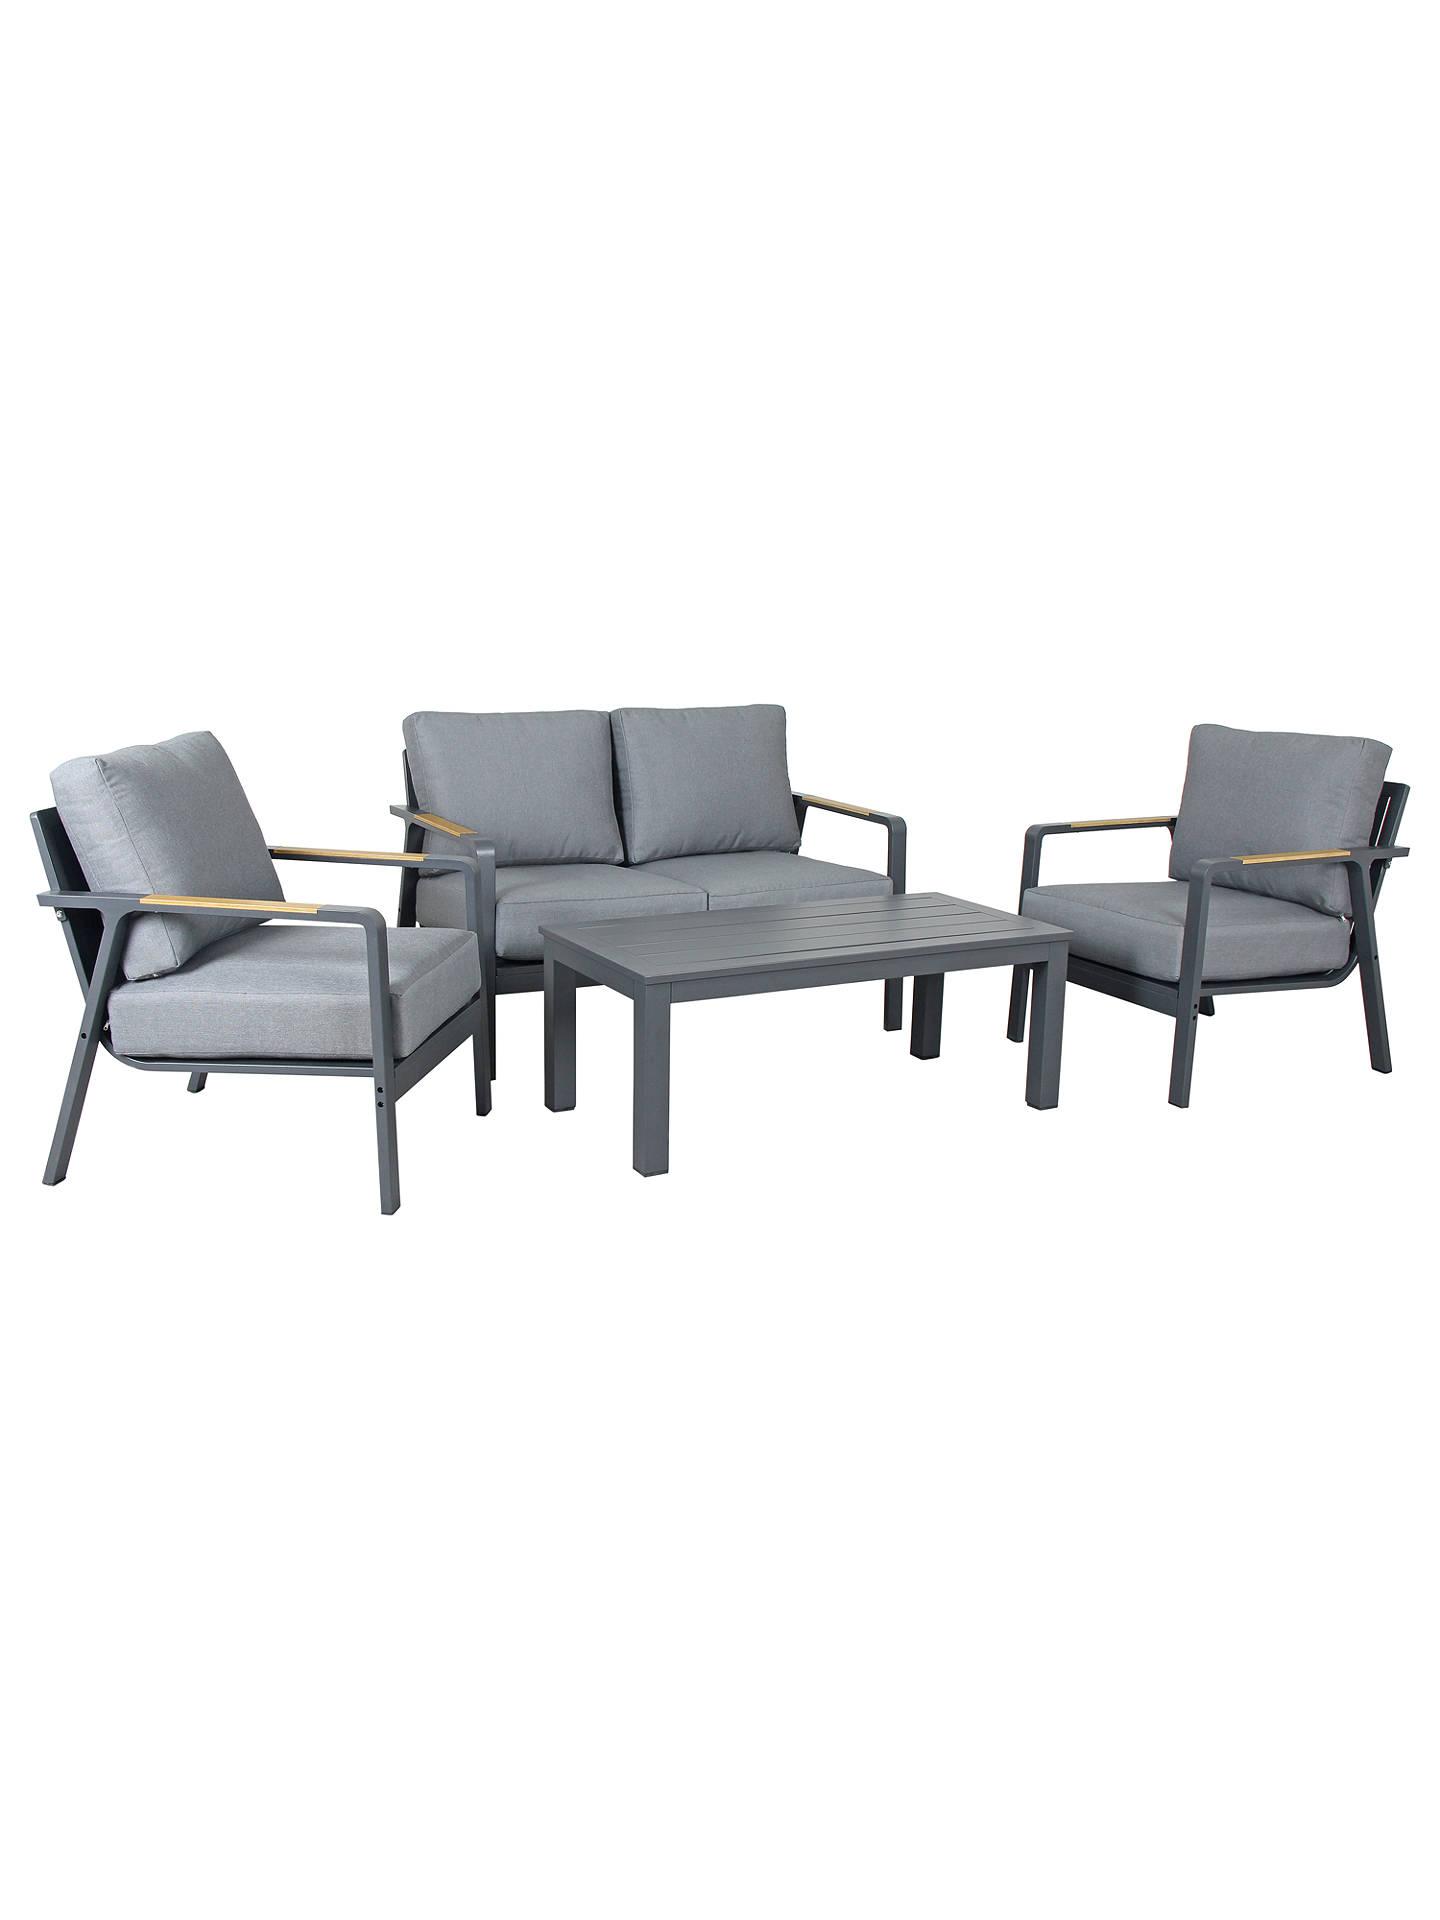 Cuba Loungeset Light Grey.Kettler Paros 4 Seater Garden Lounge Set Grey At John Lewis Partners